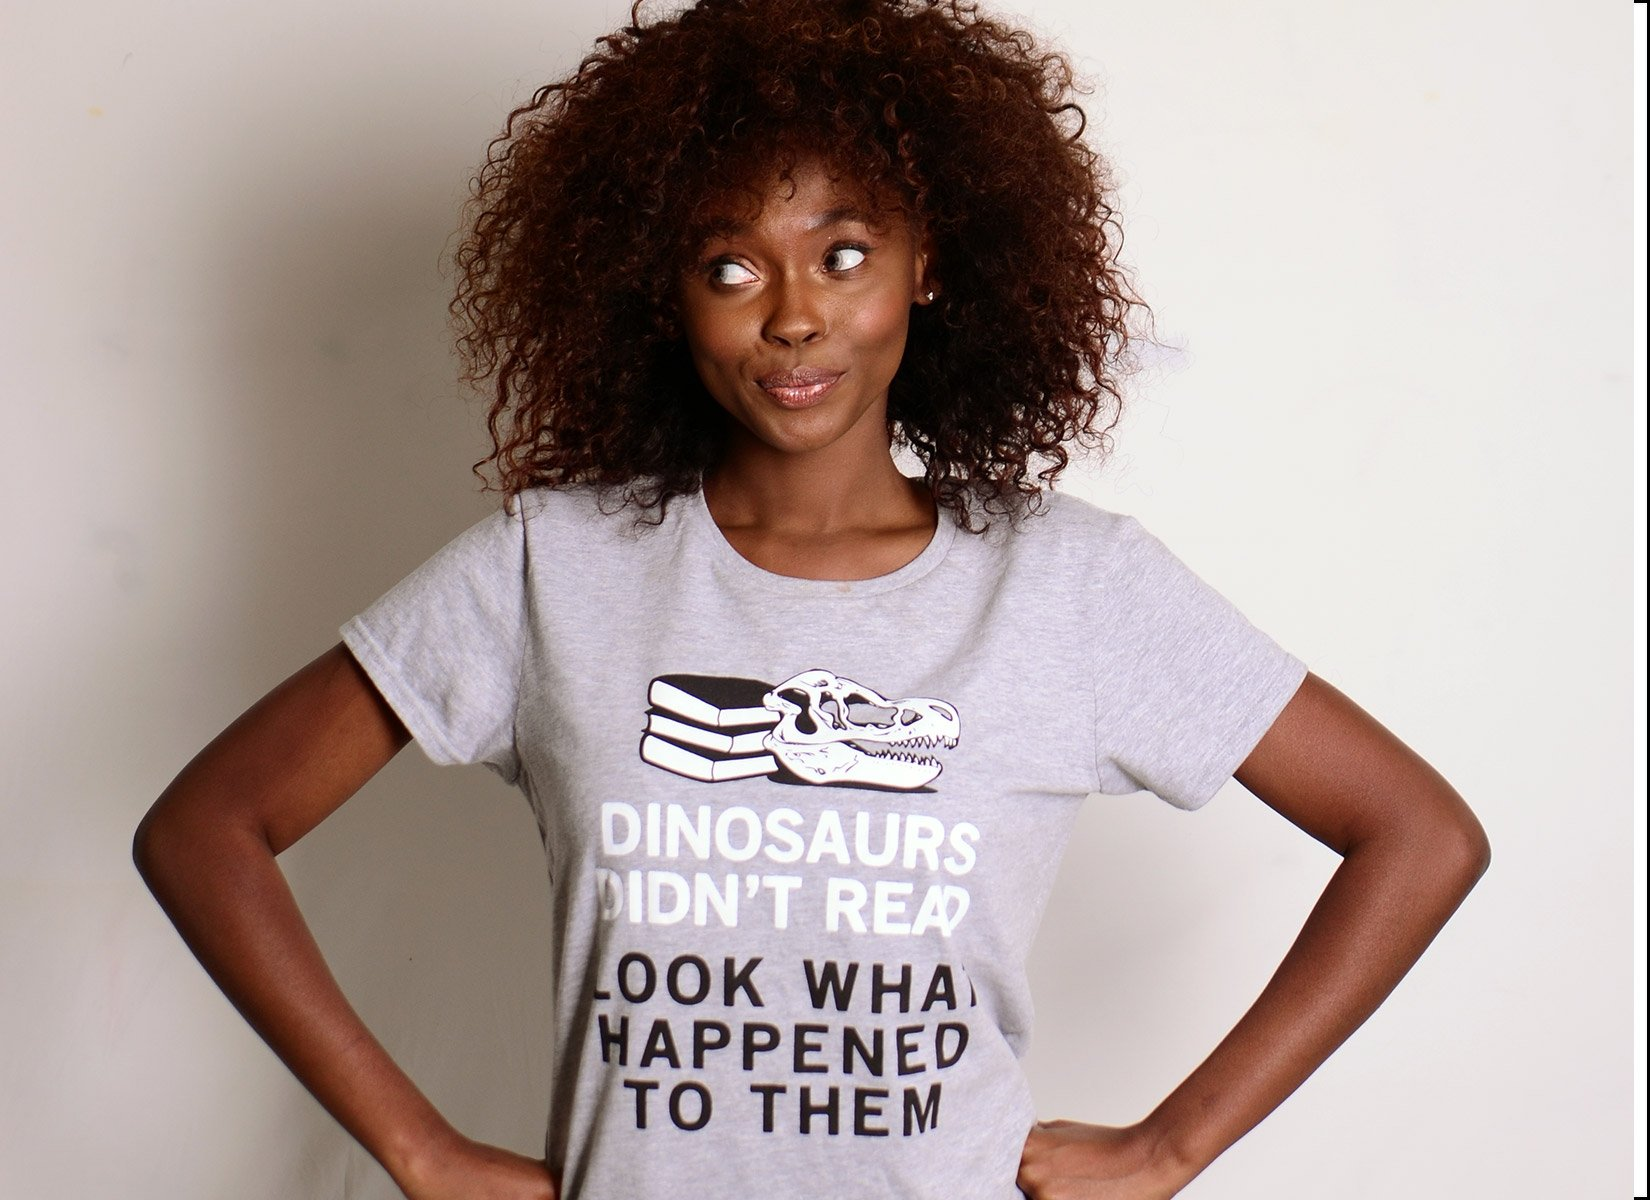 Dinosaurs Didn't Read on Womens T-Shirt